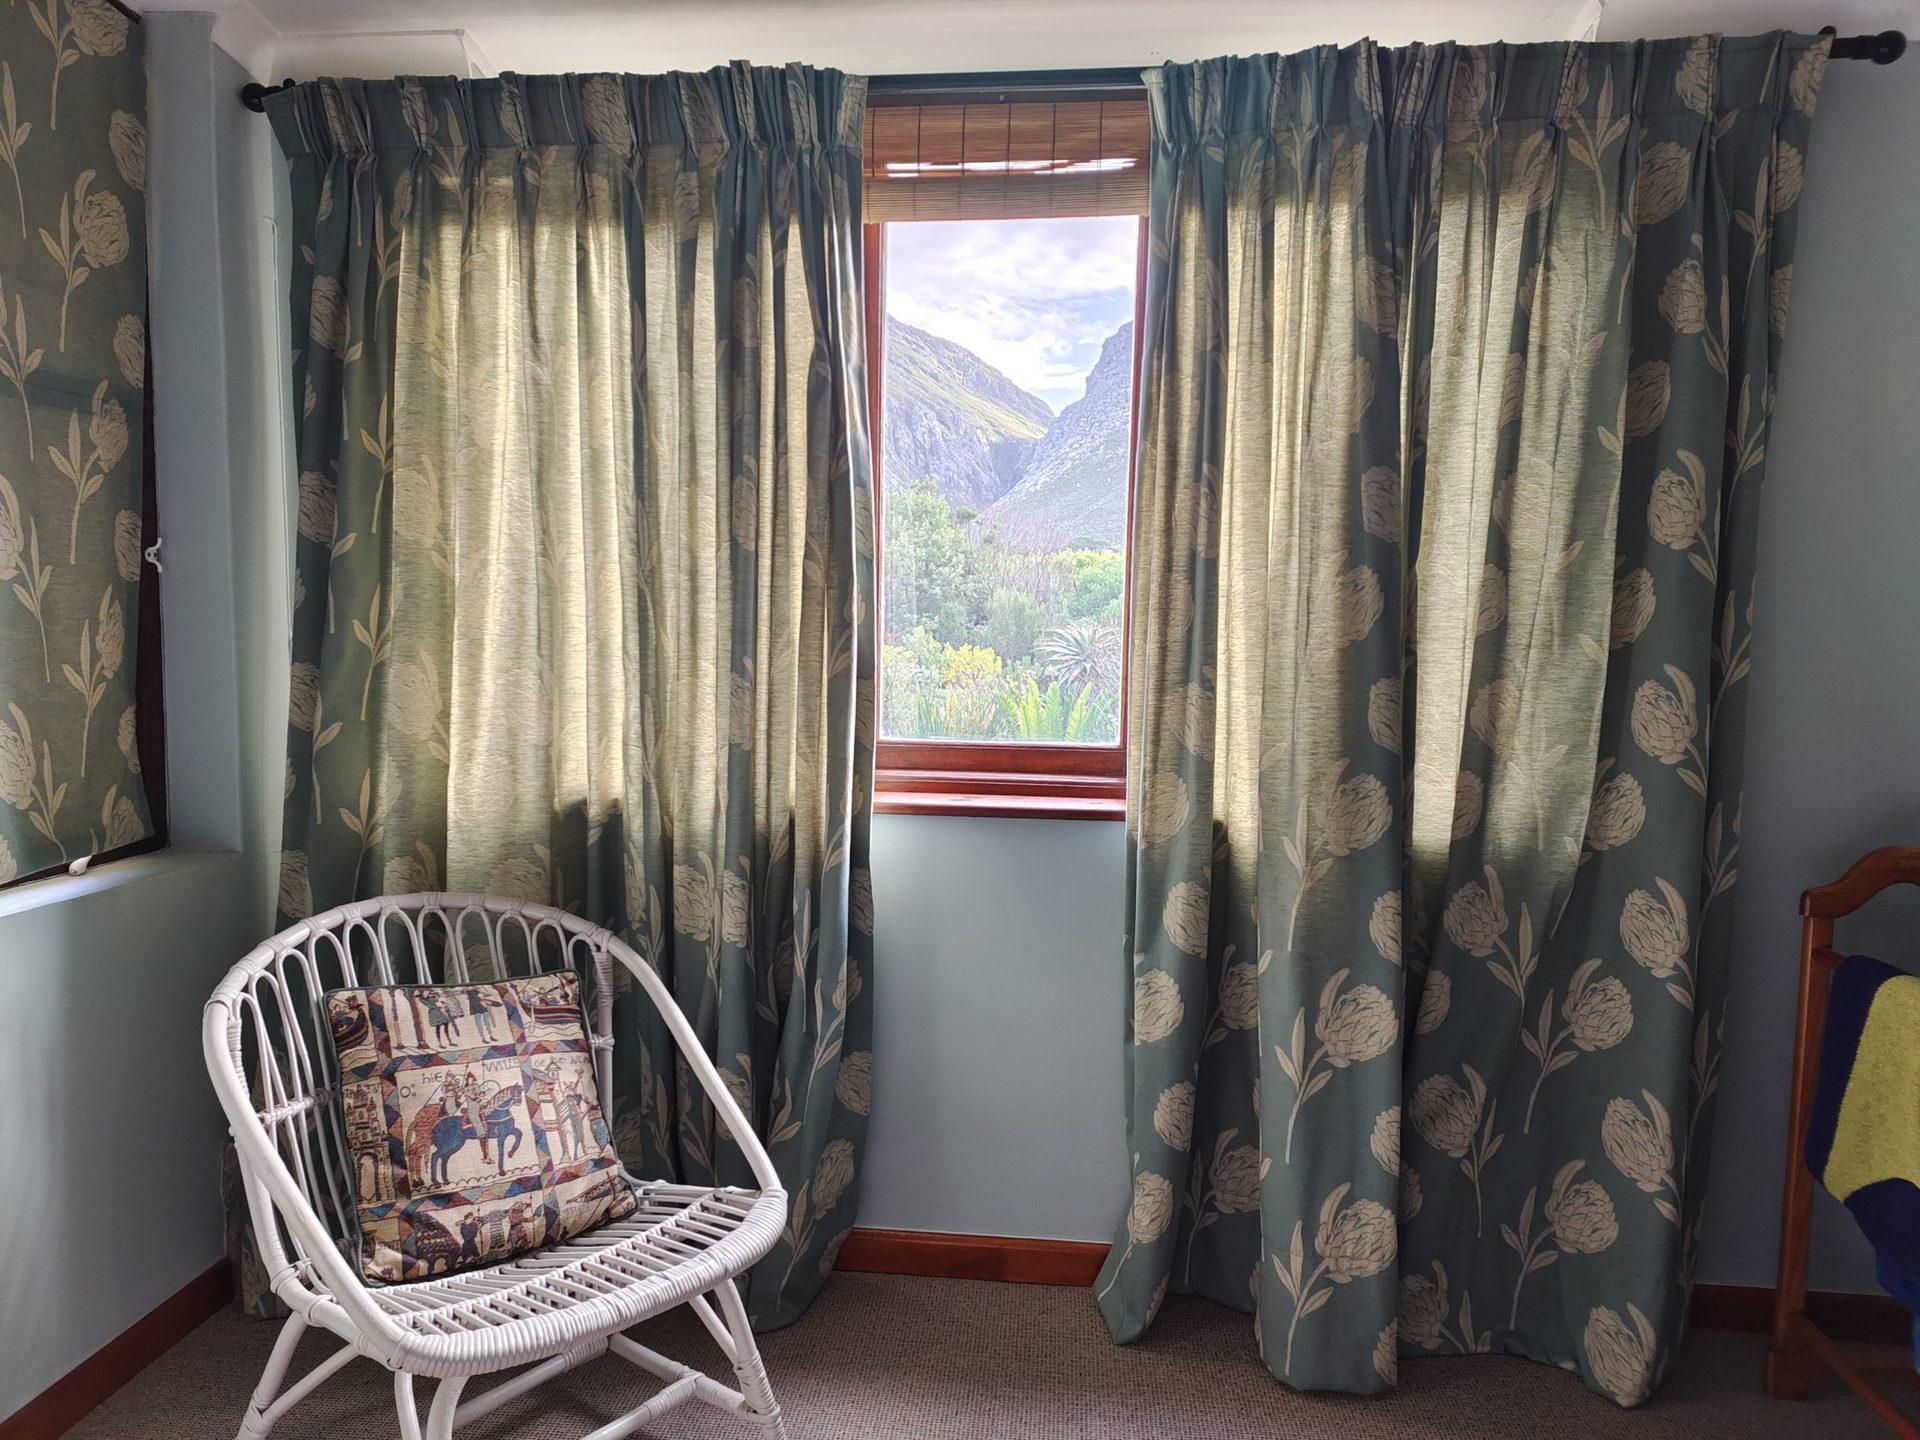 Vivo X60 Pro Plus bedroom window